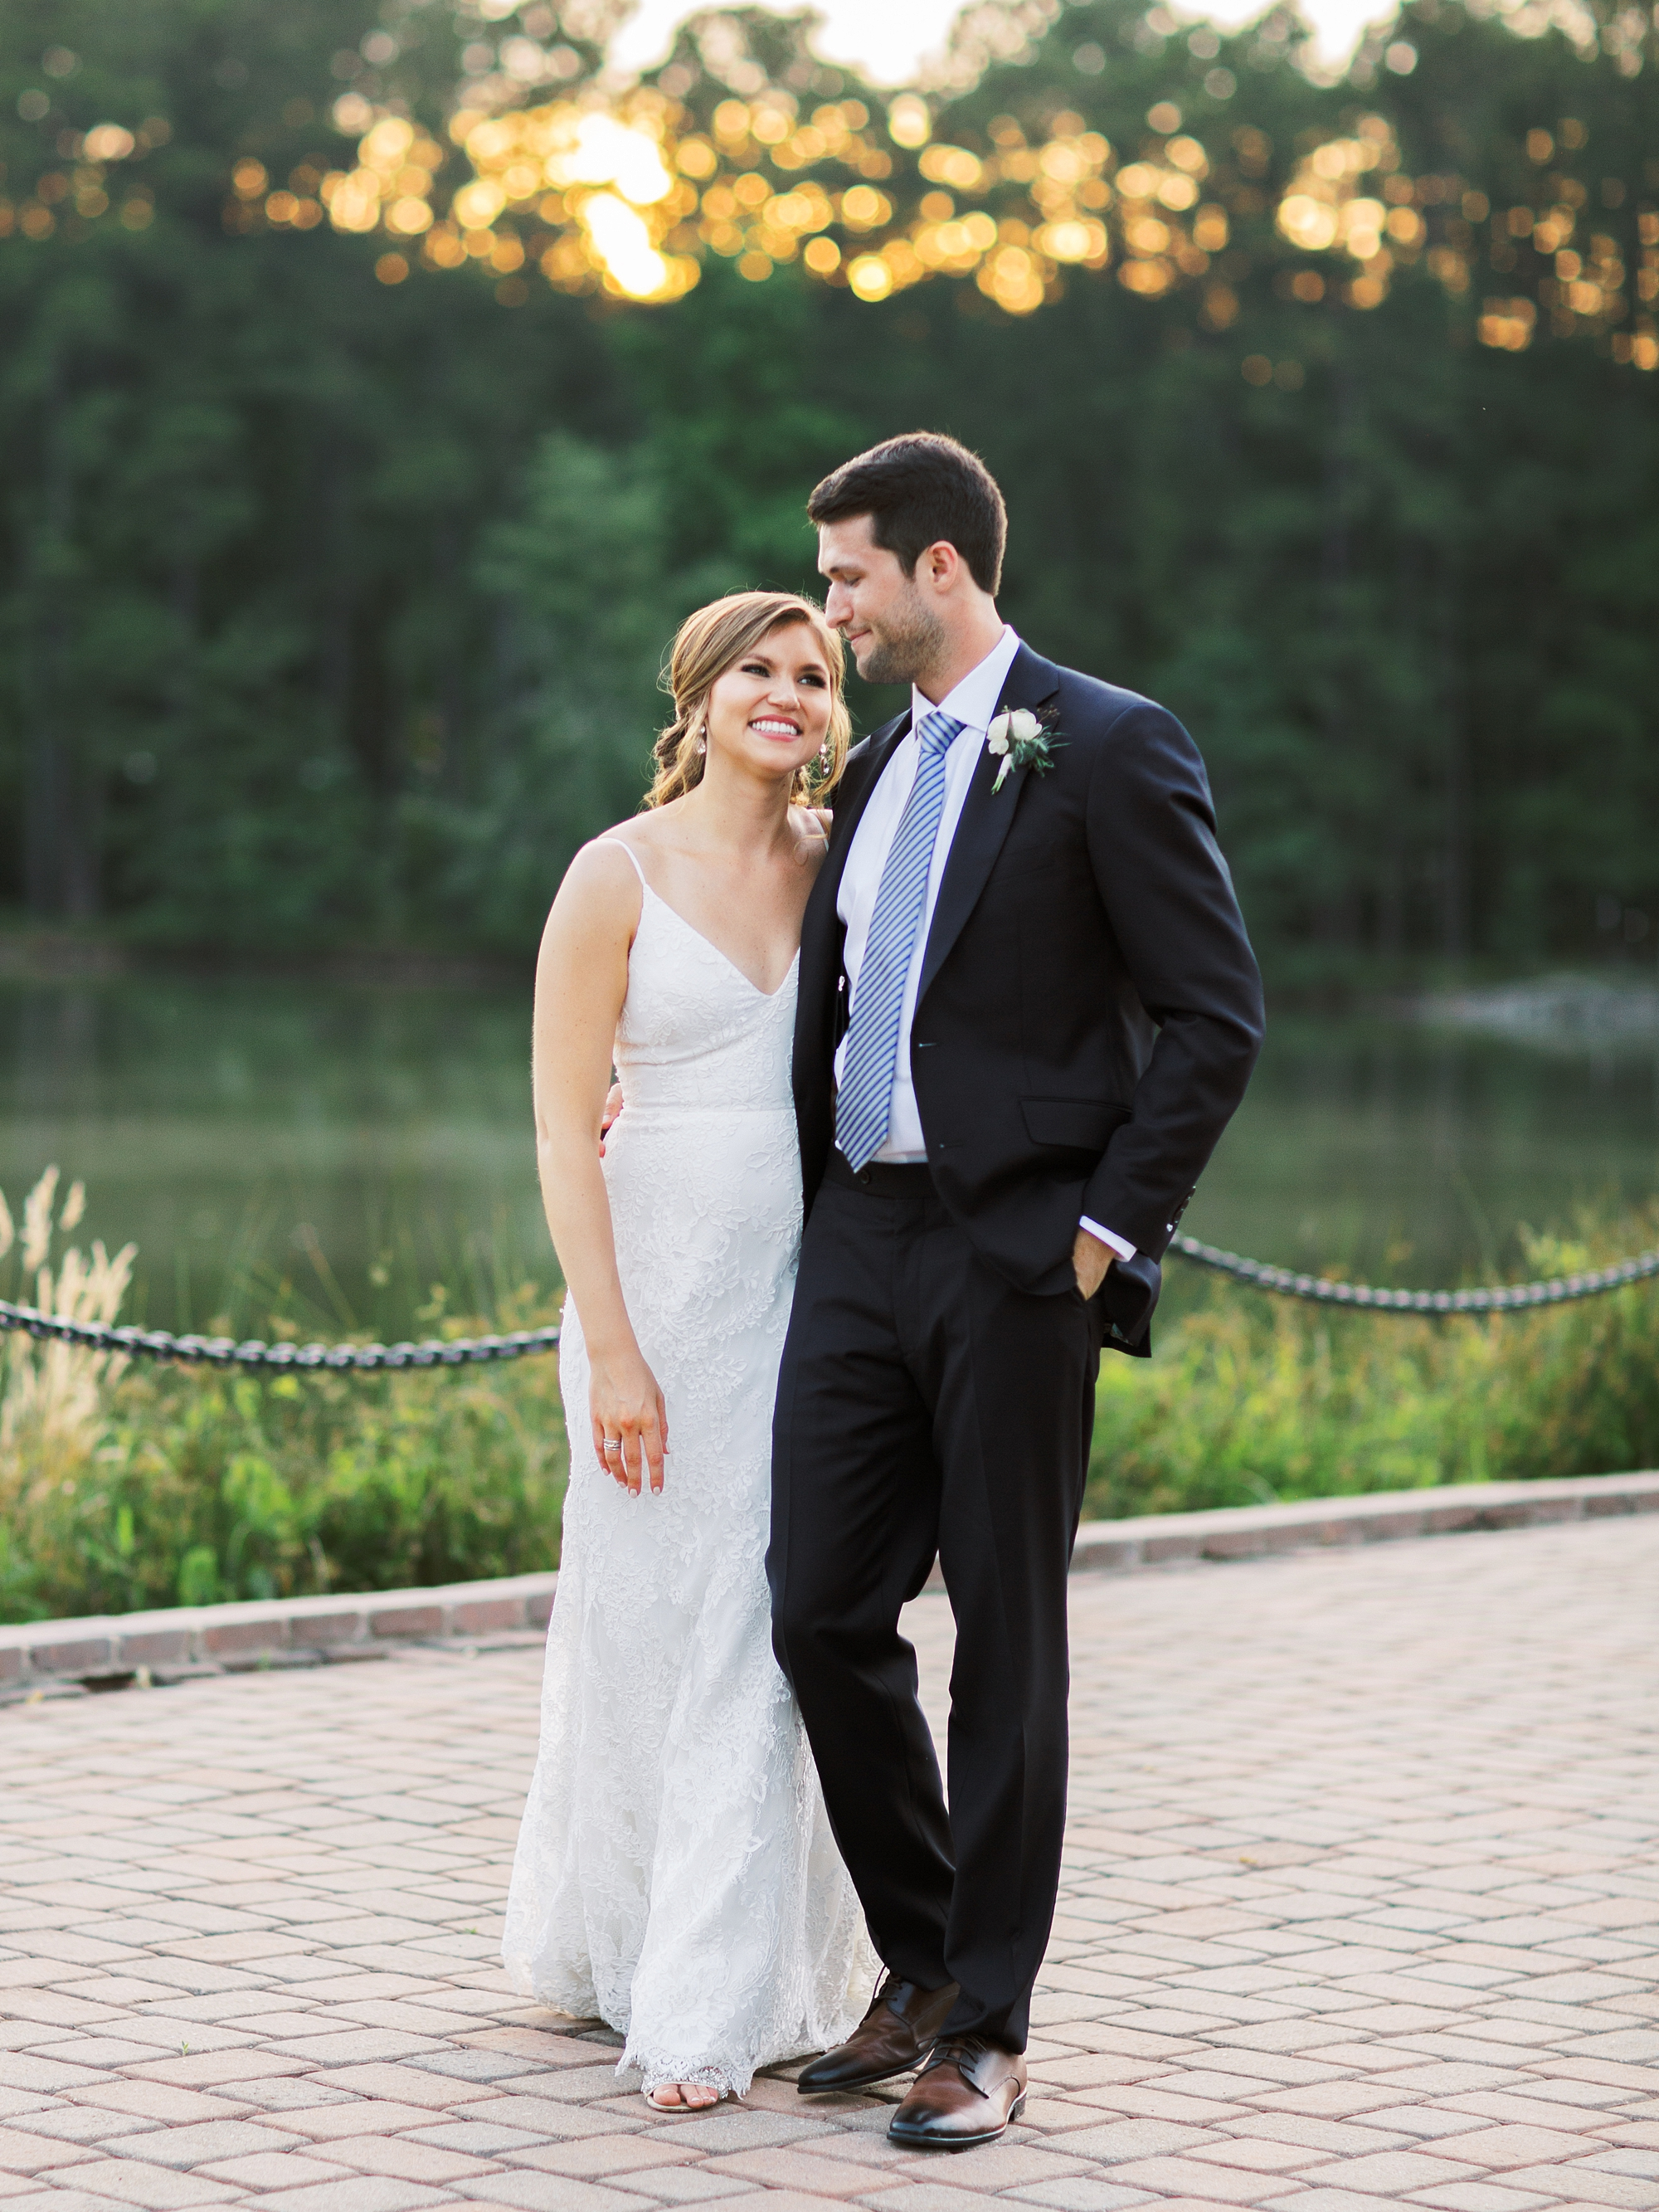 Angus-Barn-Pavilion-Raleigh-Wedding-Film-Photographer_0173.jpg